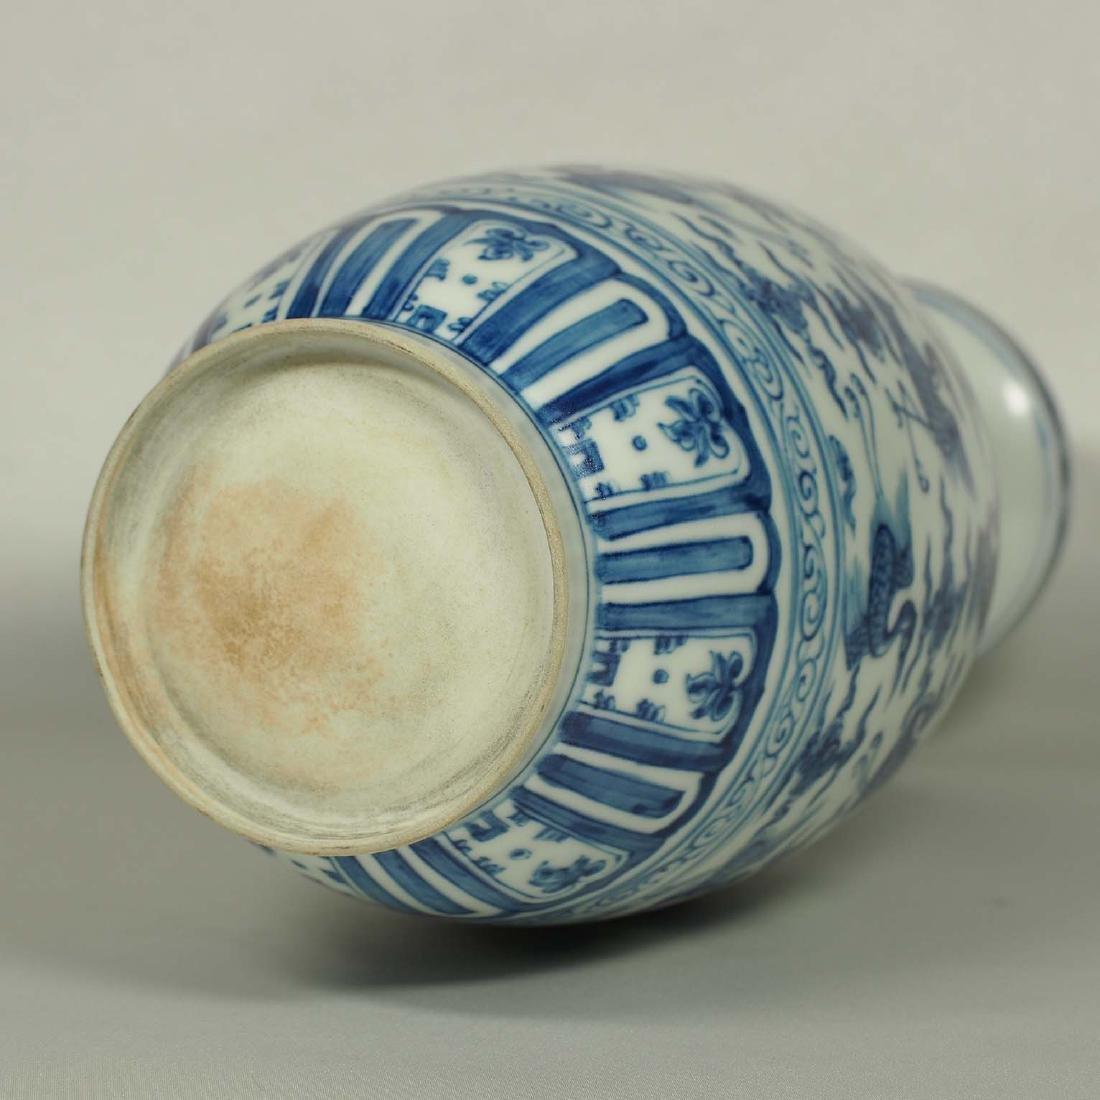 Vase with Flying Cranes Design, Ming Dynasty - 6